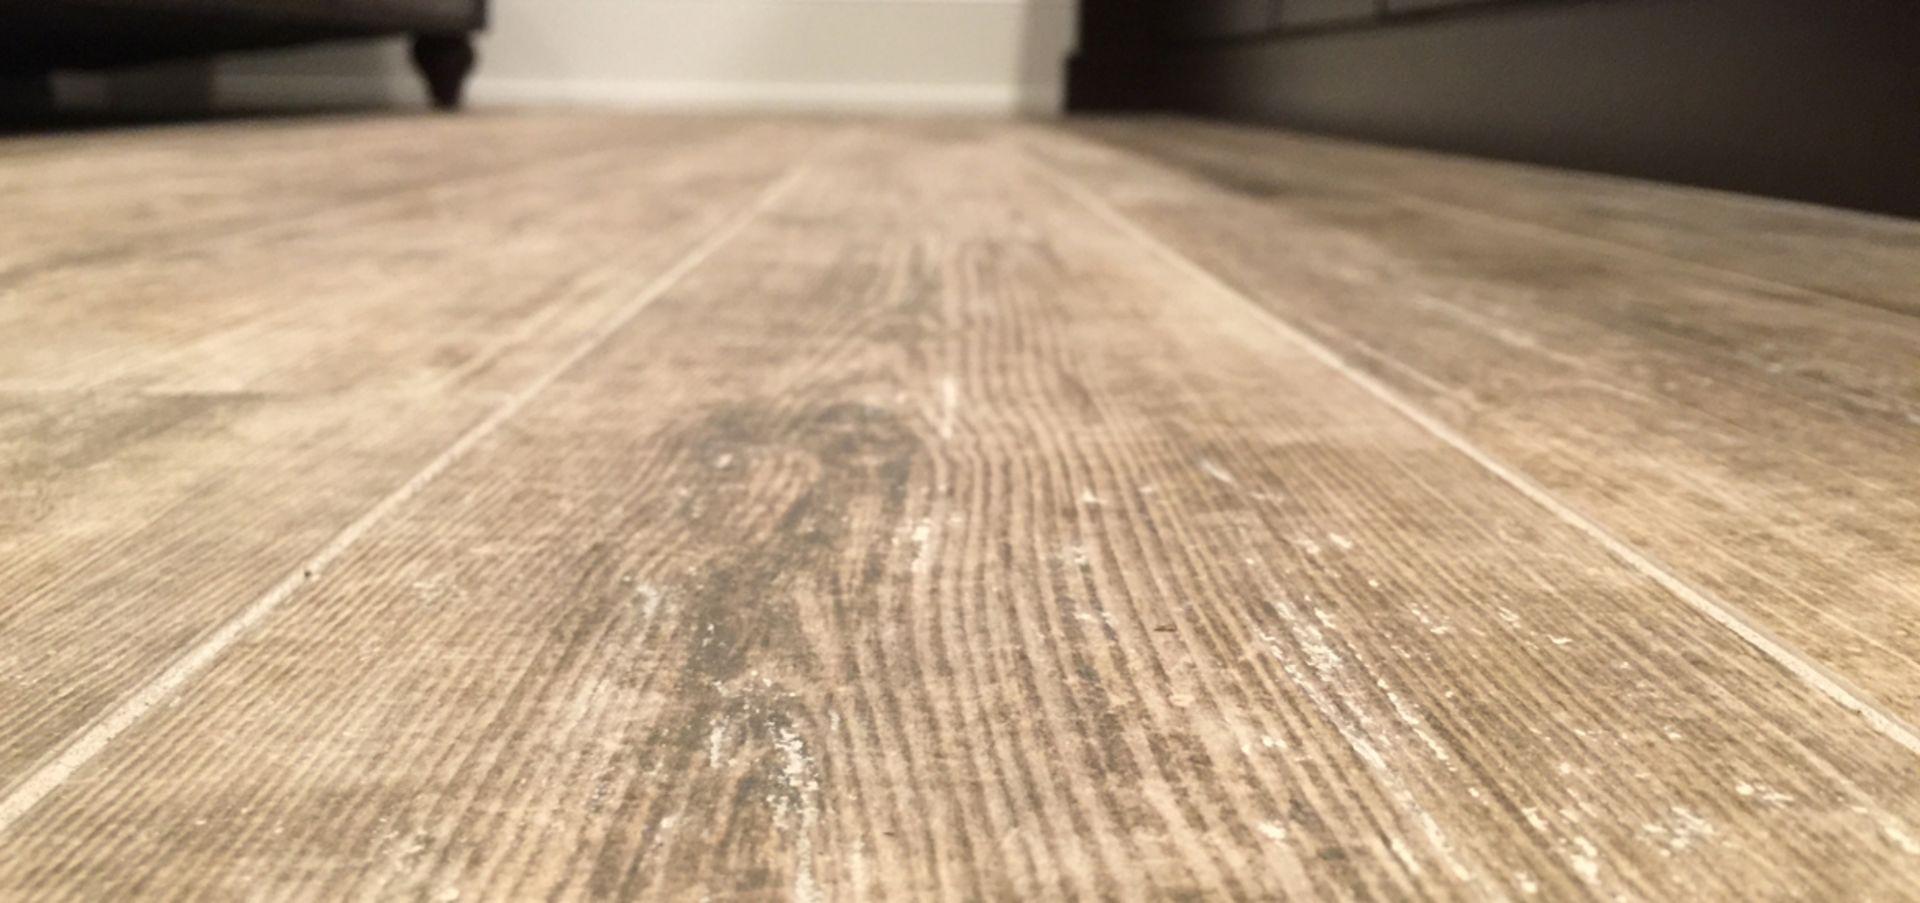 Design Feature: Wood Tile Floors